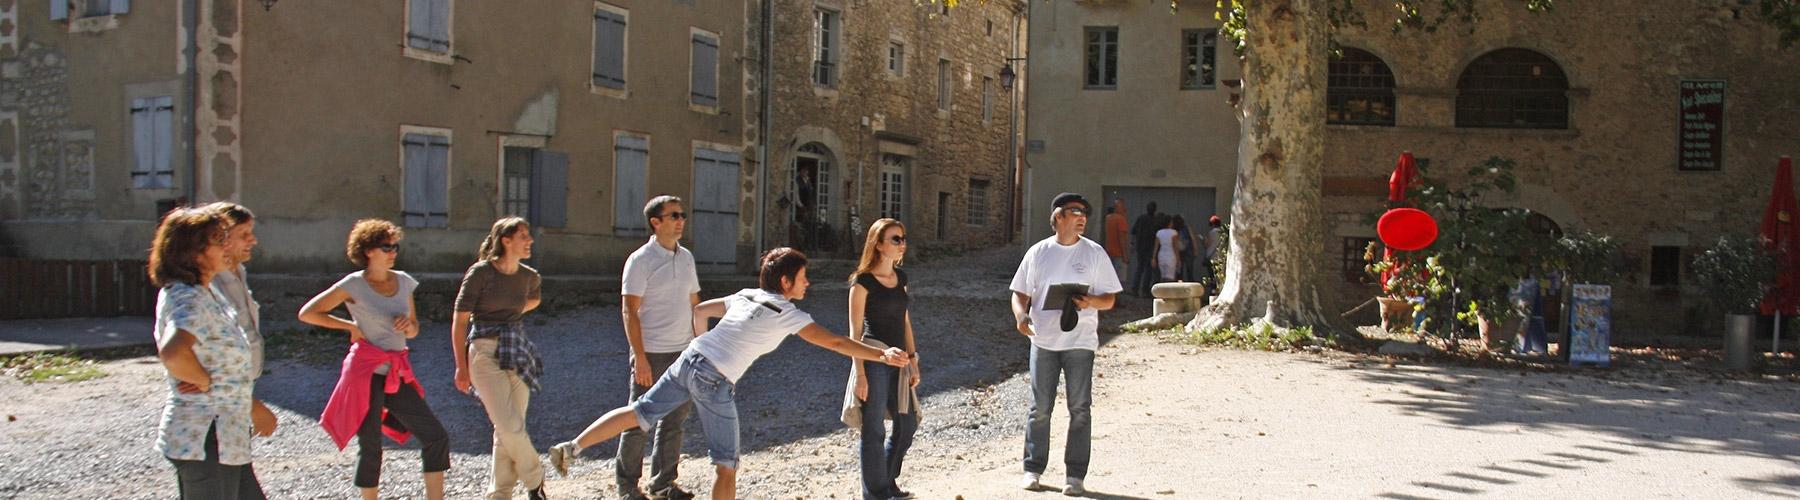 "Seminar in the Ardèche: A walking tour round a ""Village de caractère"""